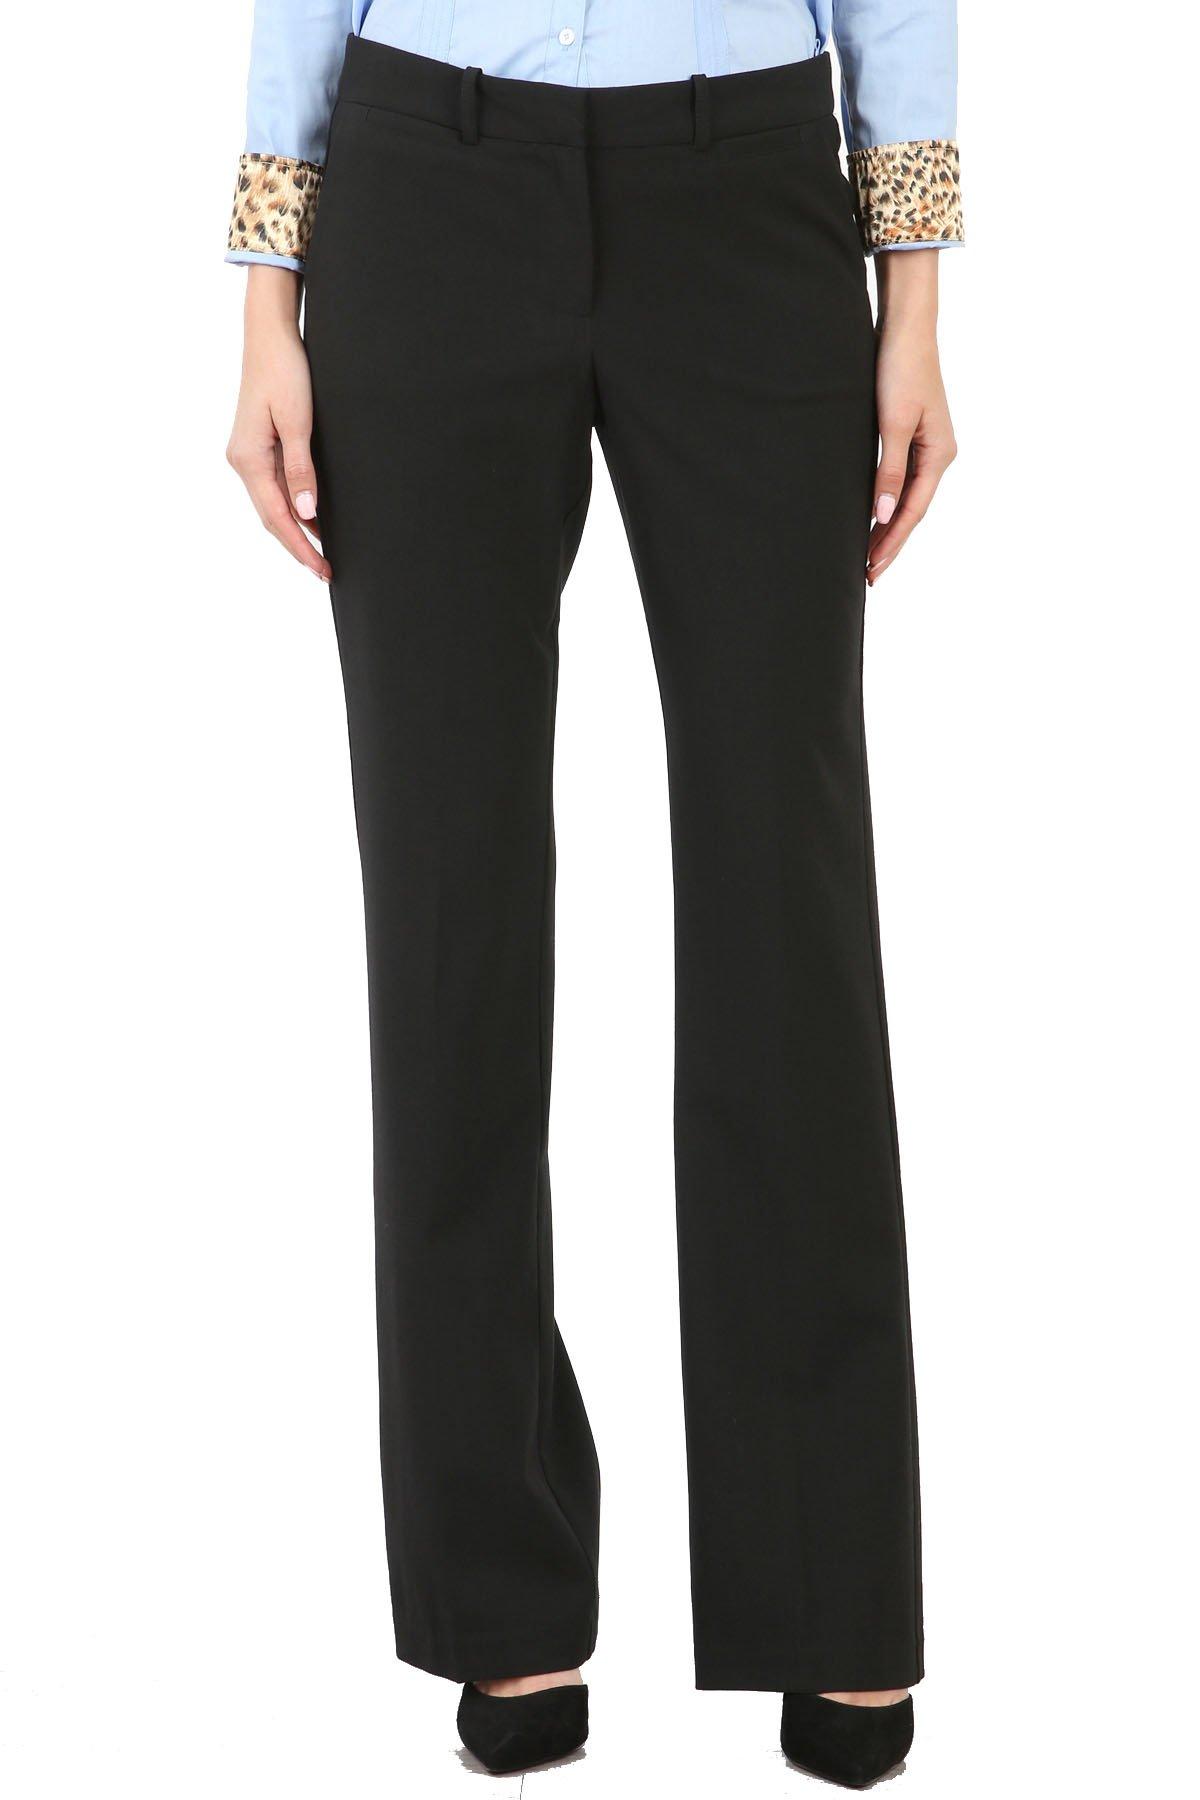 Maryclan Career Women's Dress Pants Little Boot Cut (Medium, Black)